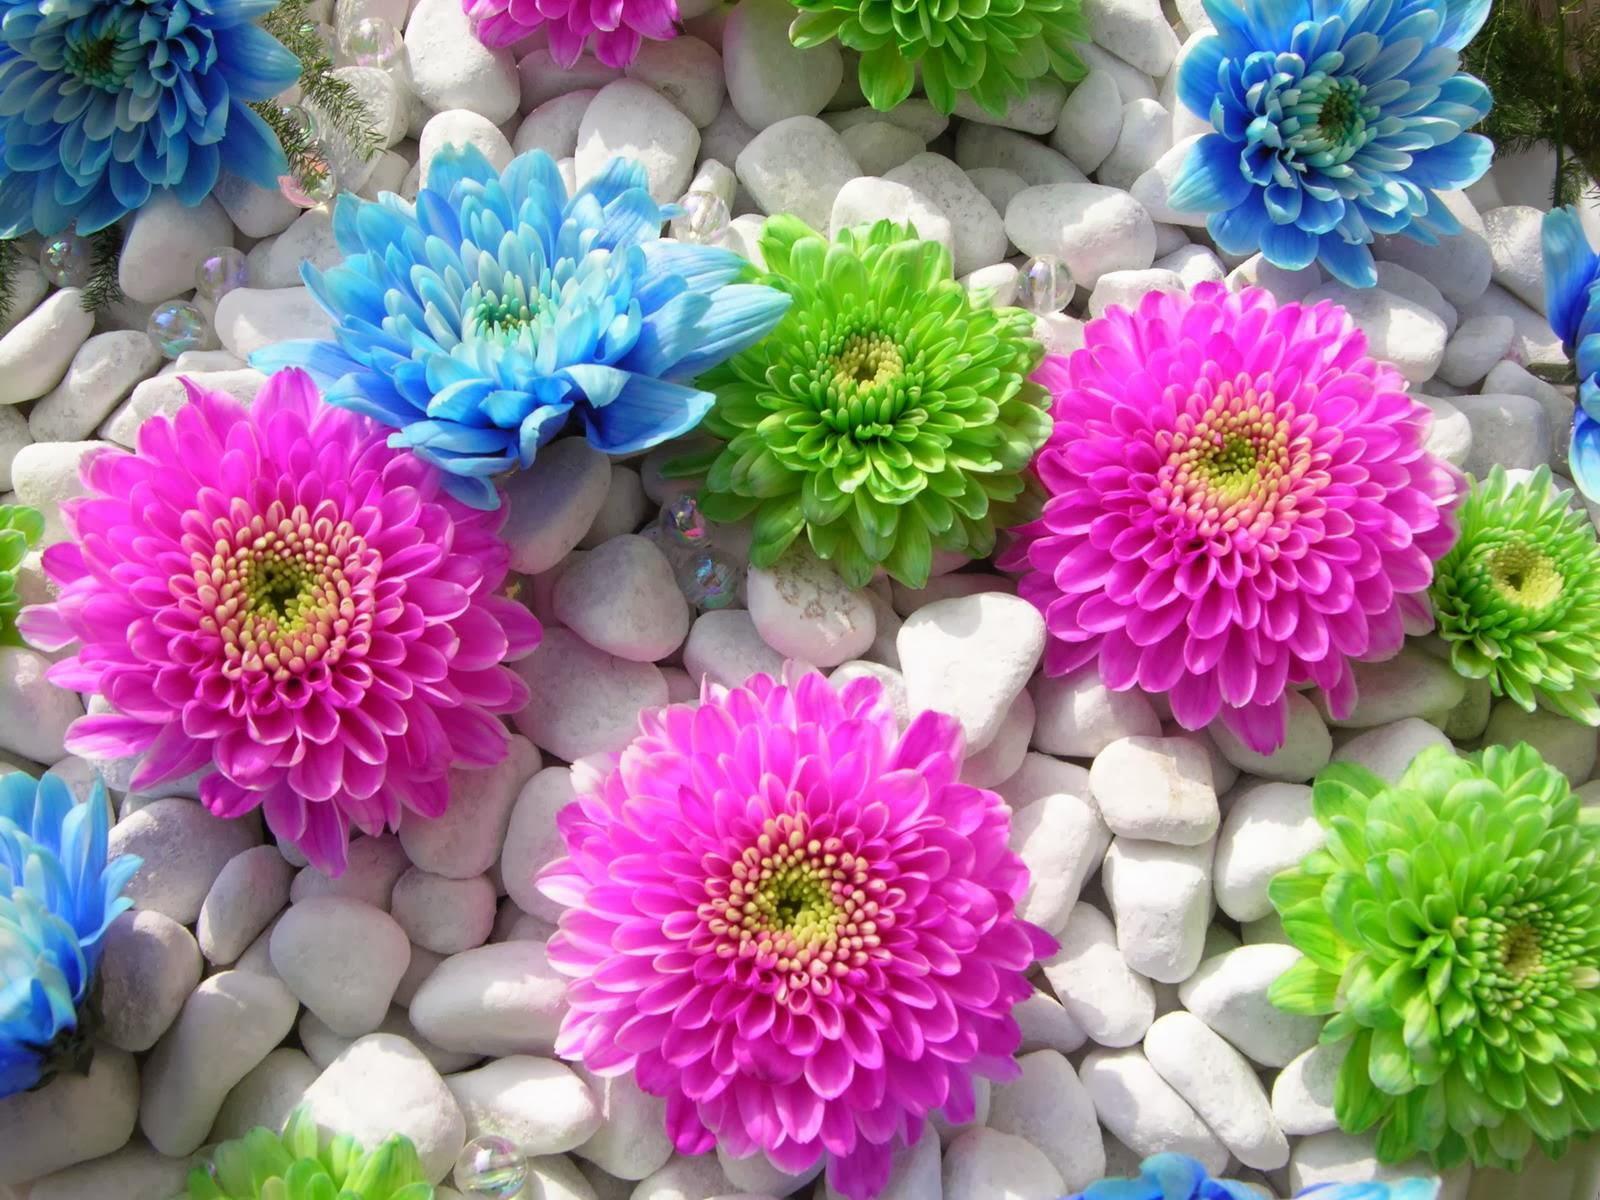 beautiful-flowers-wallpapers- (10) - HD Wallpaper